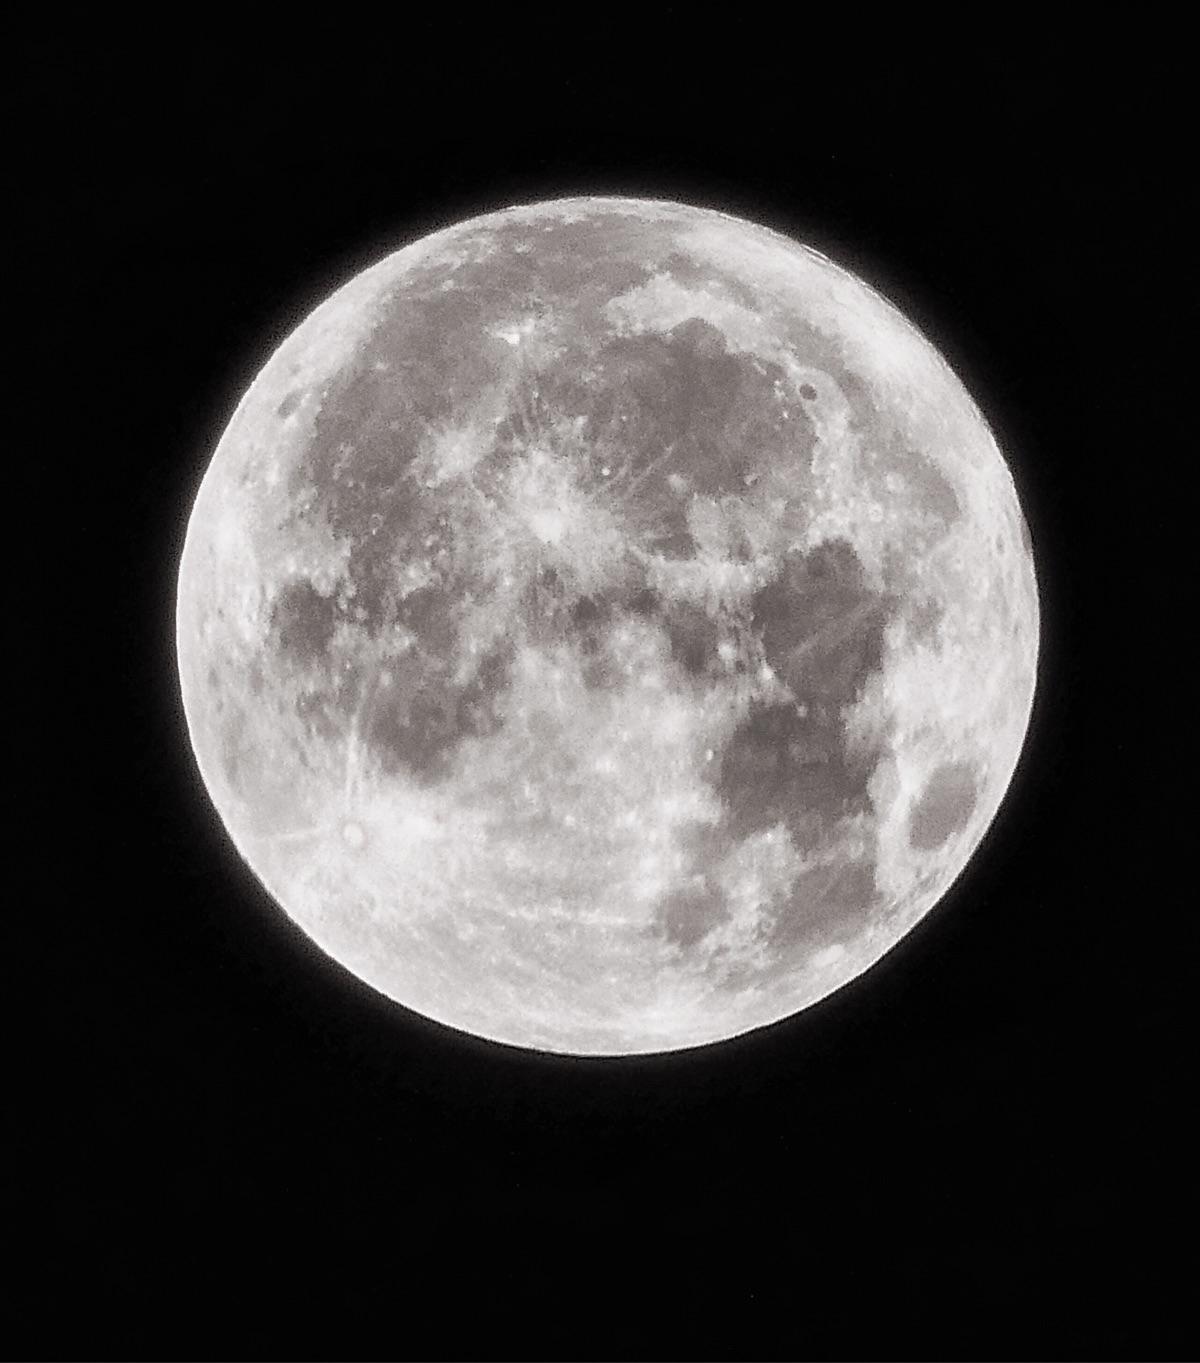 Full Moon (Panasonic Lumix TZ90 - paulbines | ello